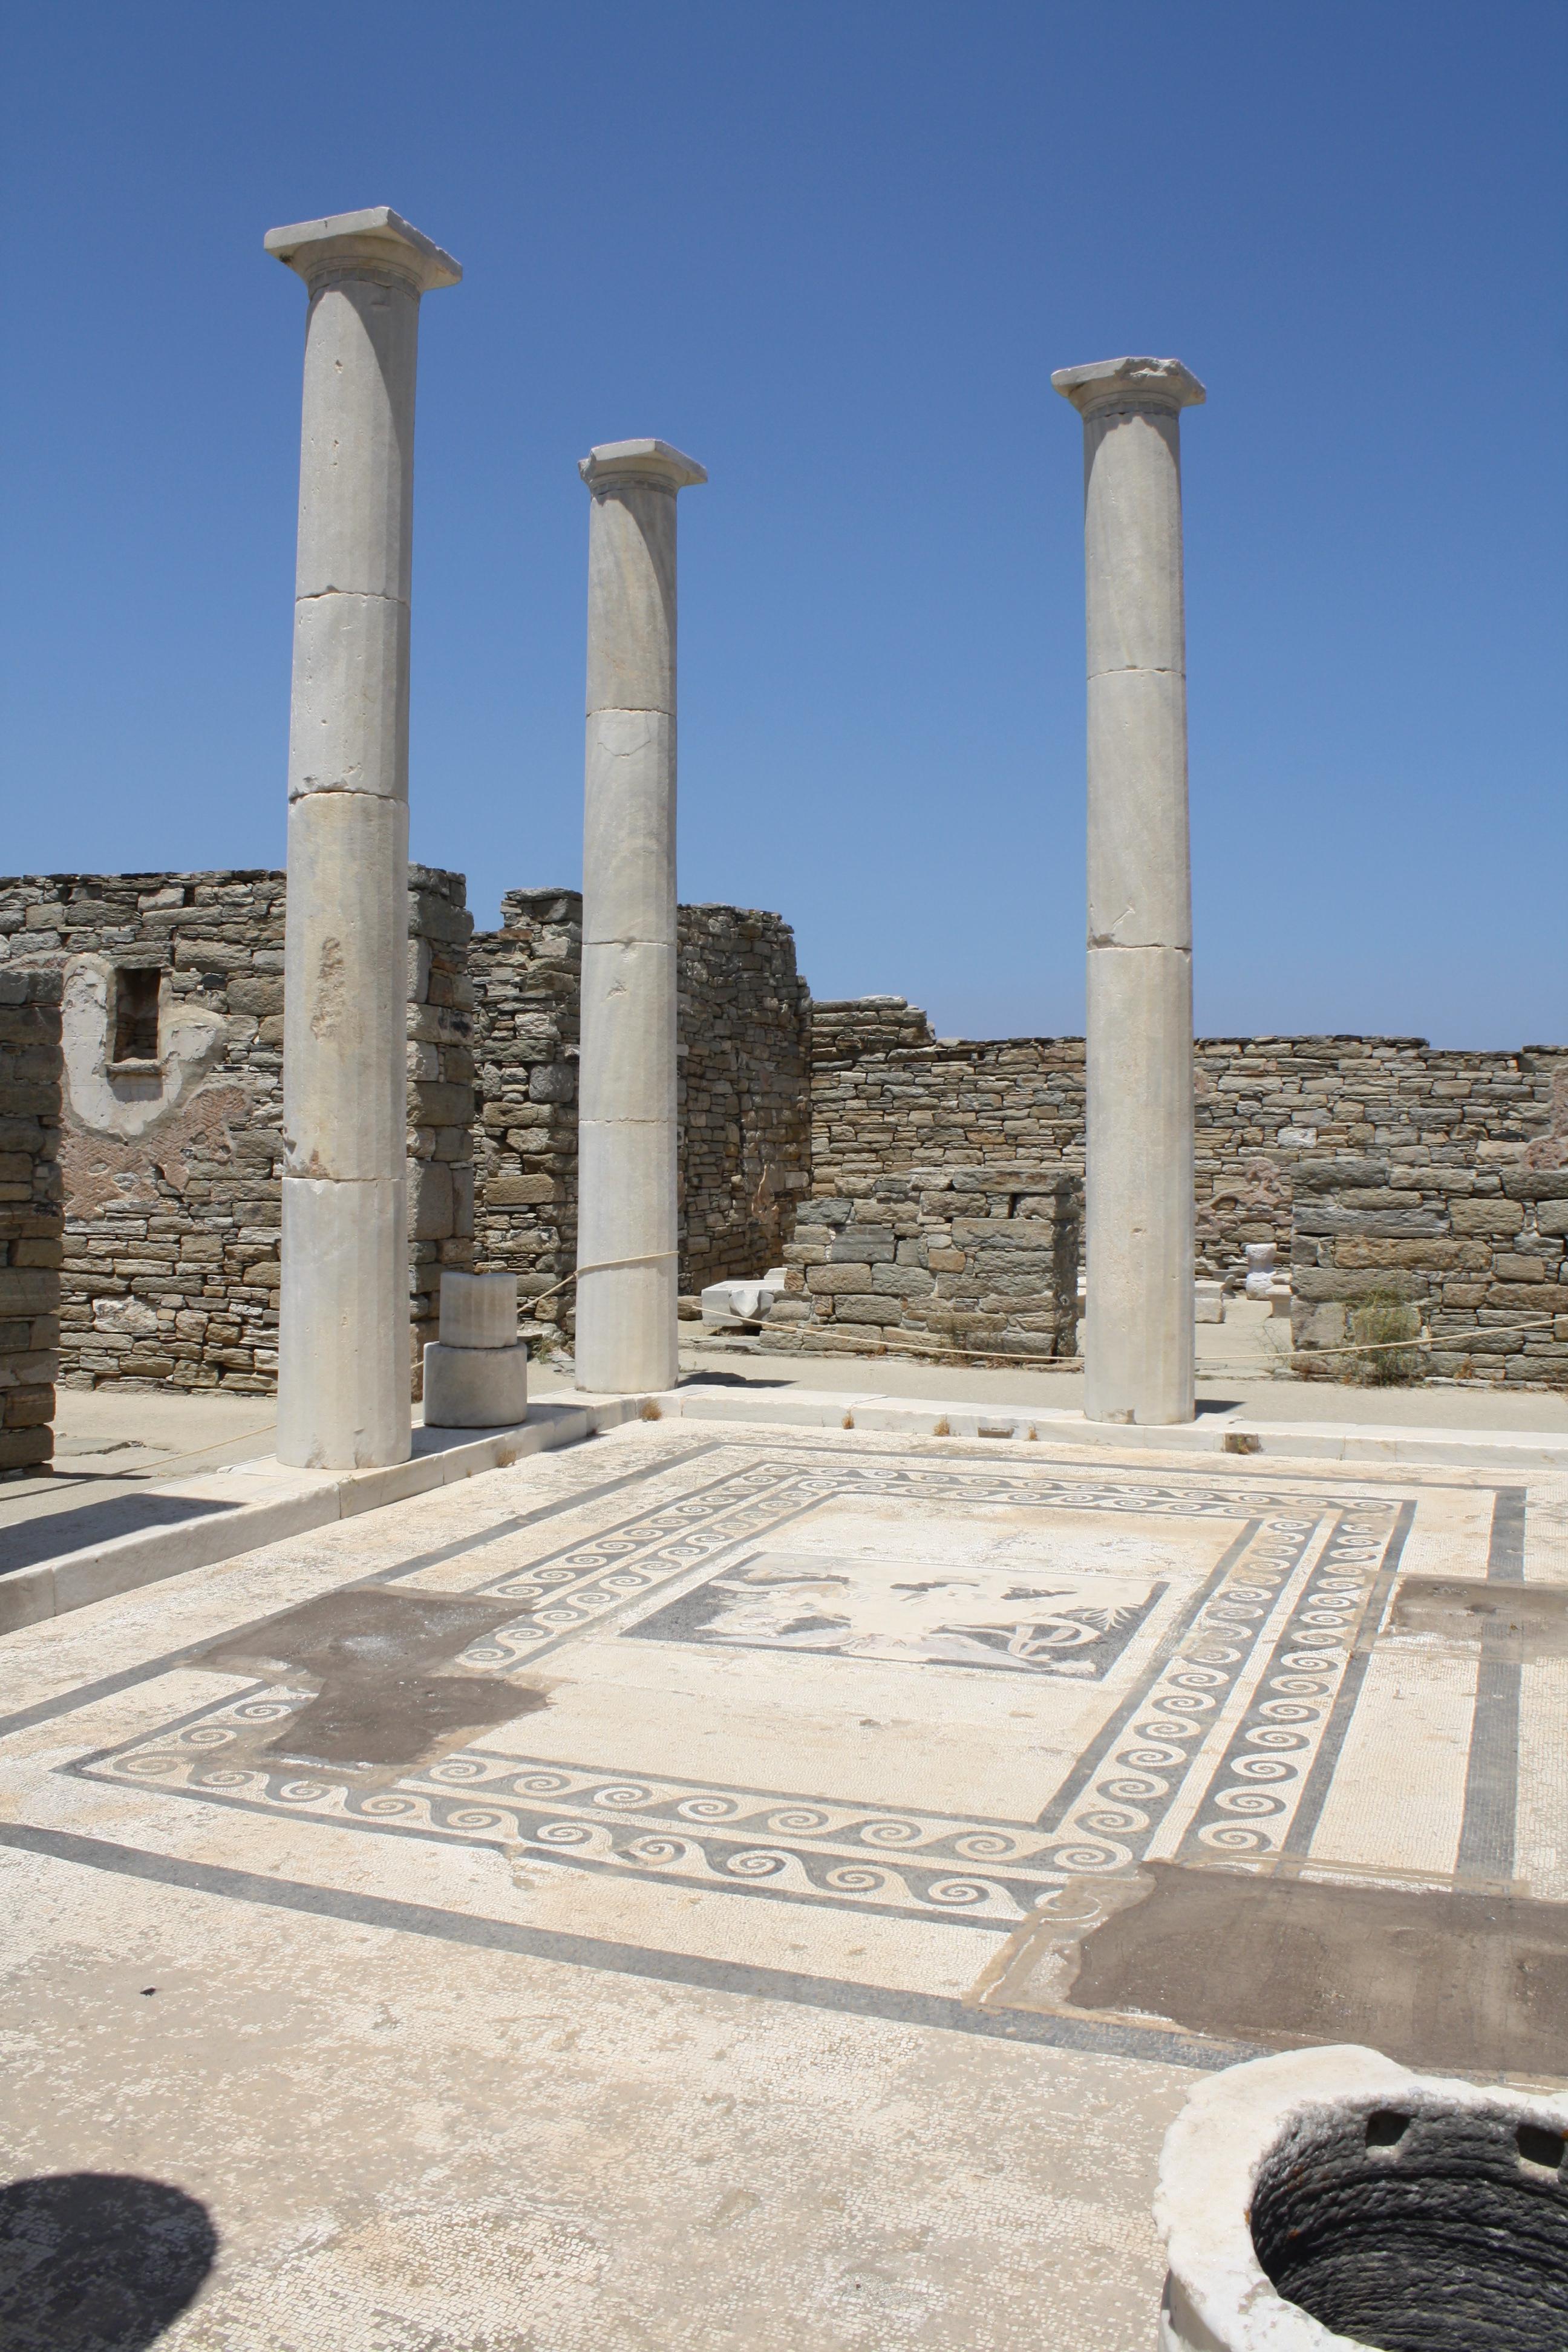 The Roman Domus (Article).